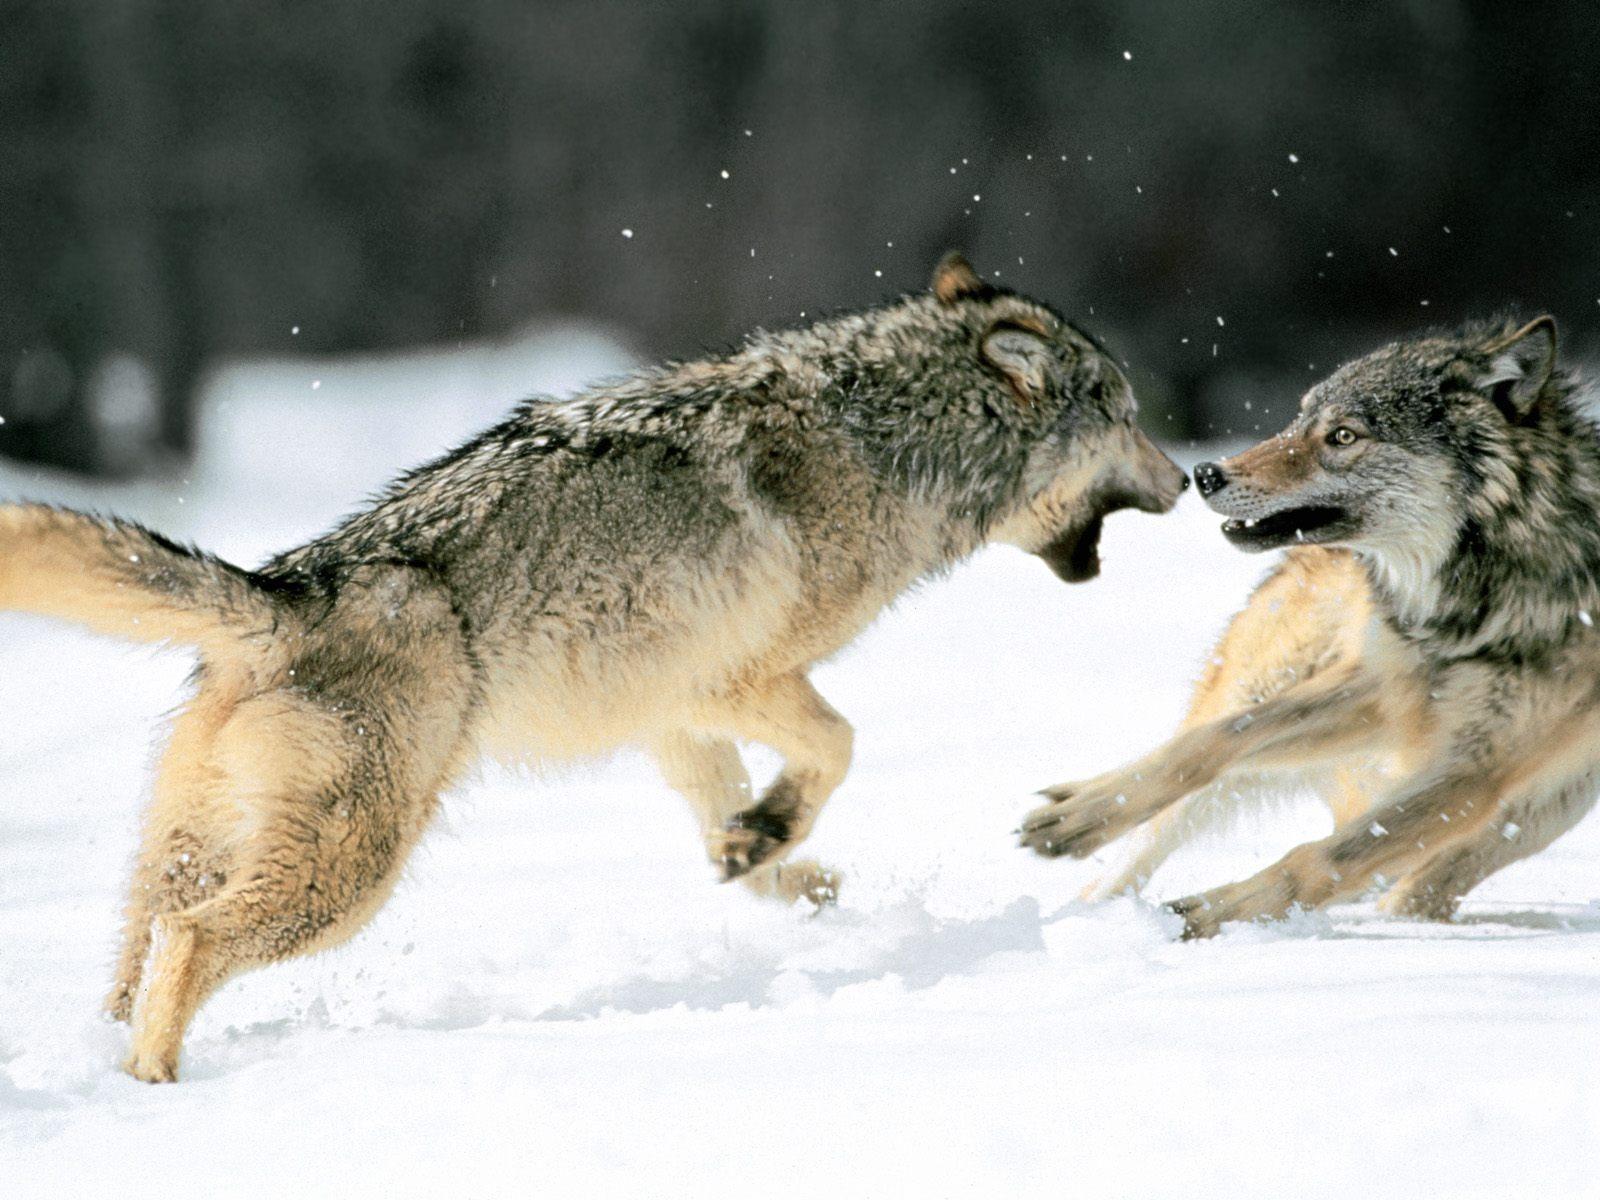 http://3.bp.blogspot.com/_nD_YgZuOadA/TS3a3yXzMBI/AAAAAAAABSA/sE5hwU0HNyY/s1600/grey-wolves-1600-1200-1028.jpg